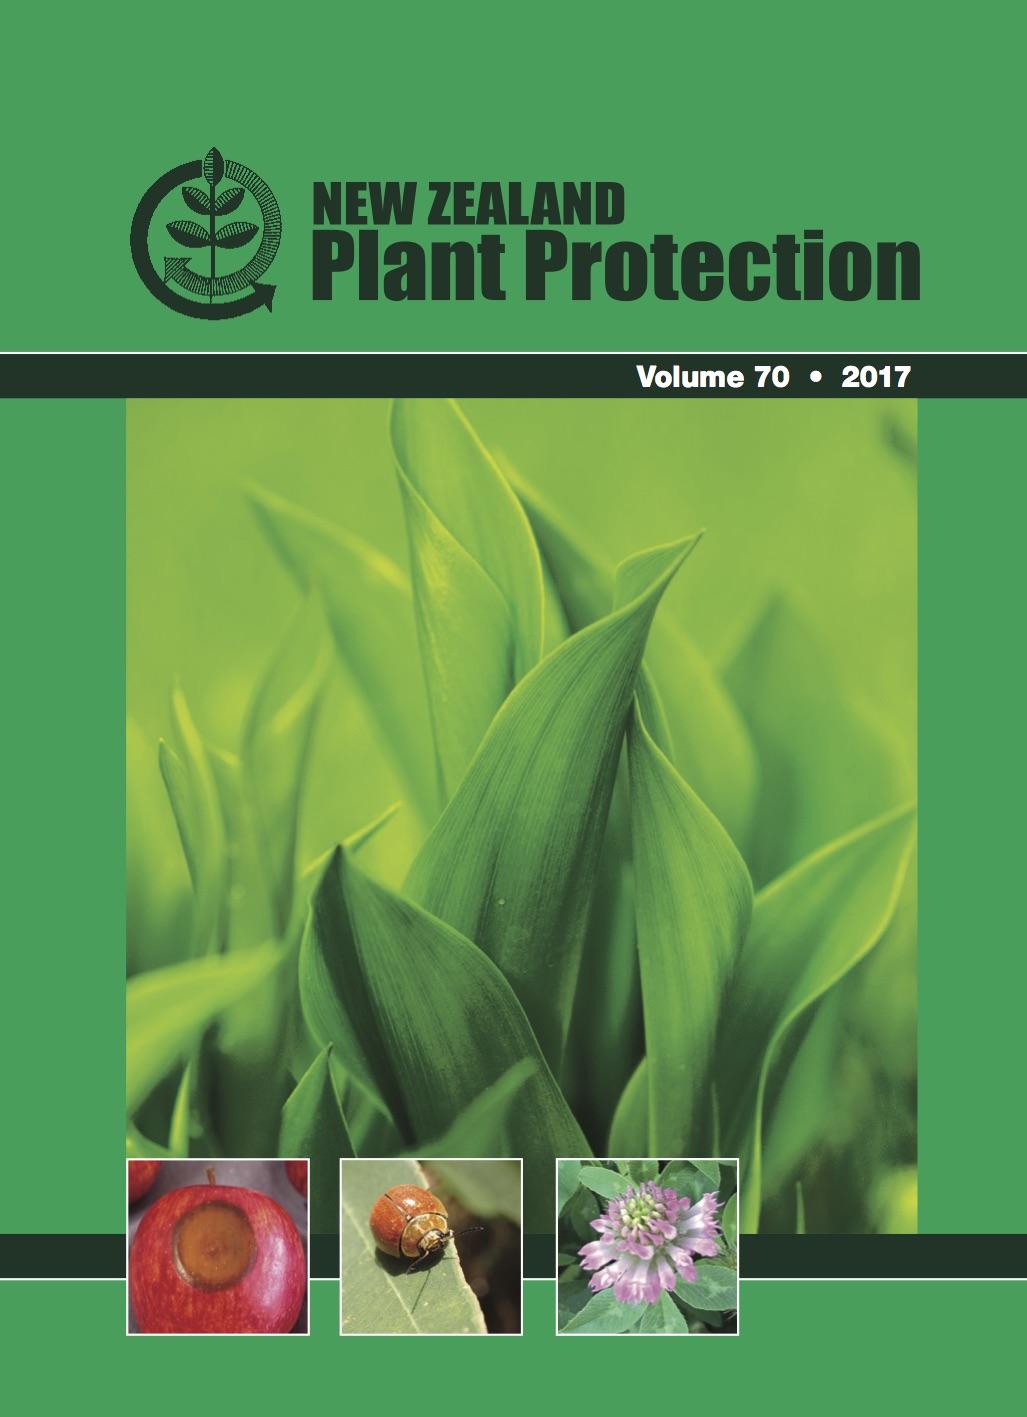 NZPP Volume 70 Cover